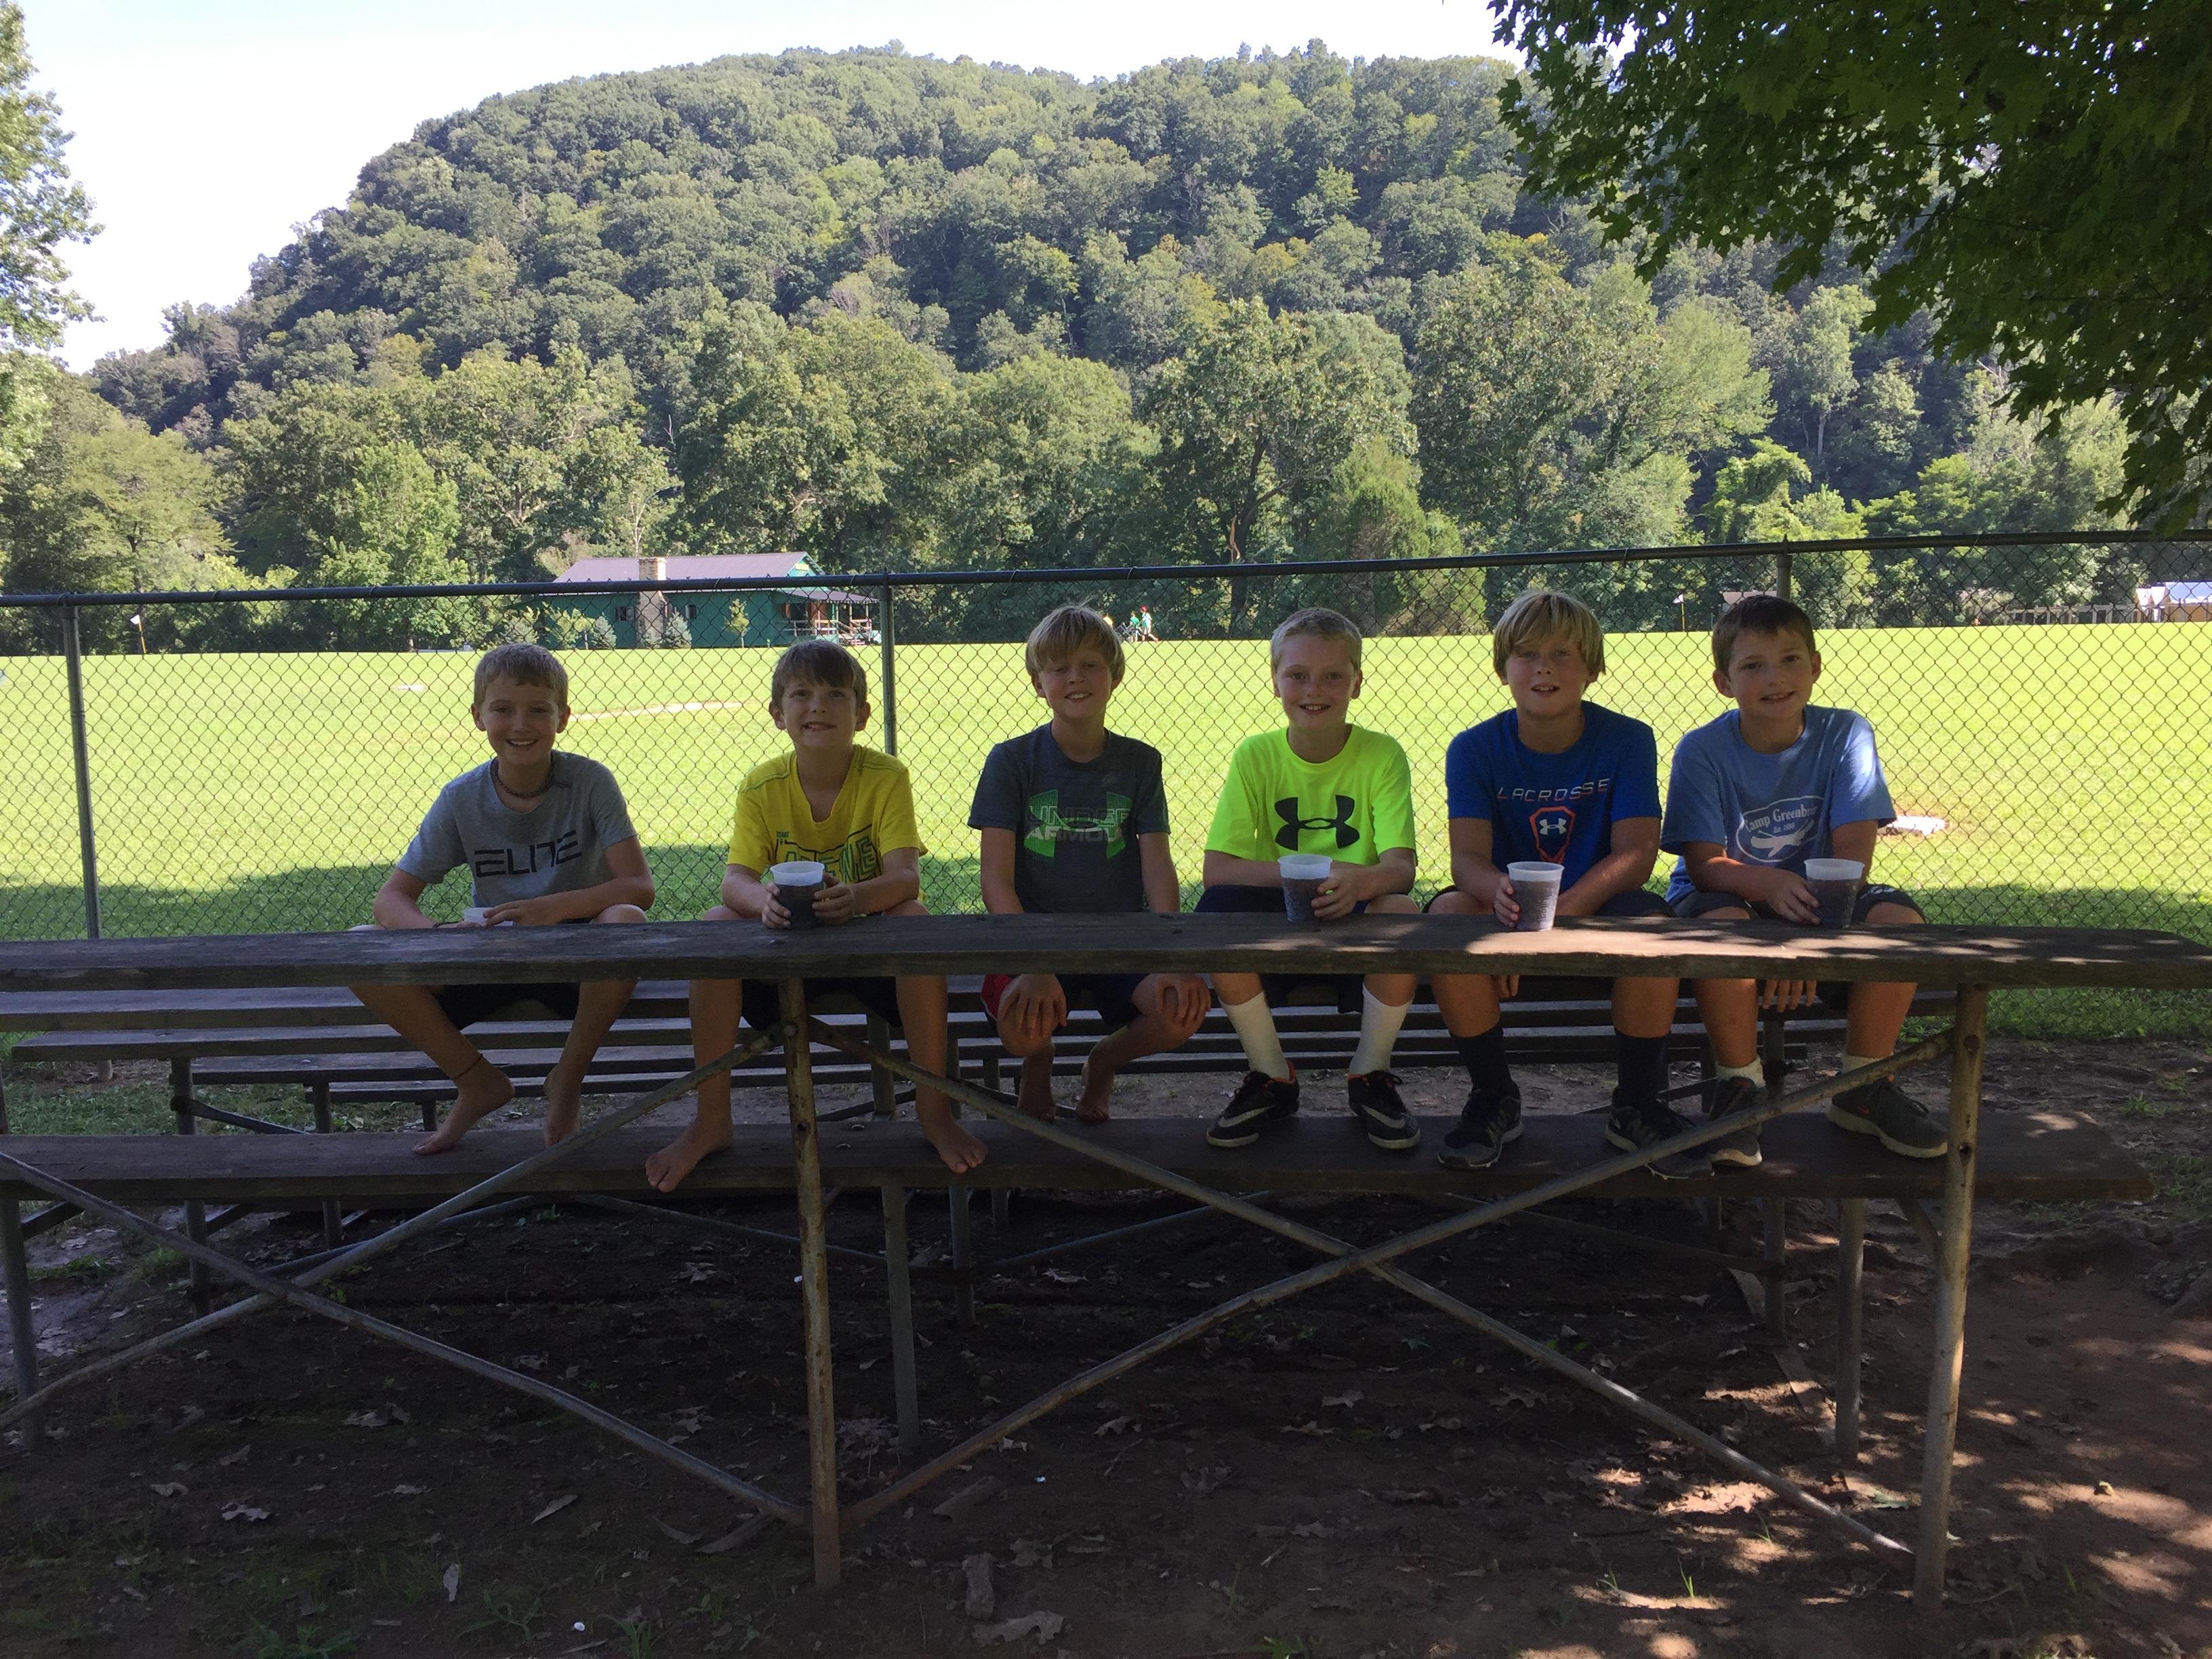 Summer Program - Traditional Camp | Camp Greenbrier